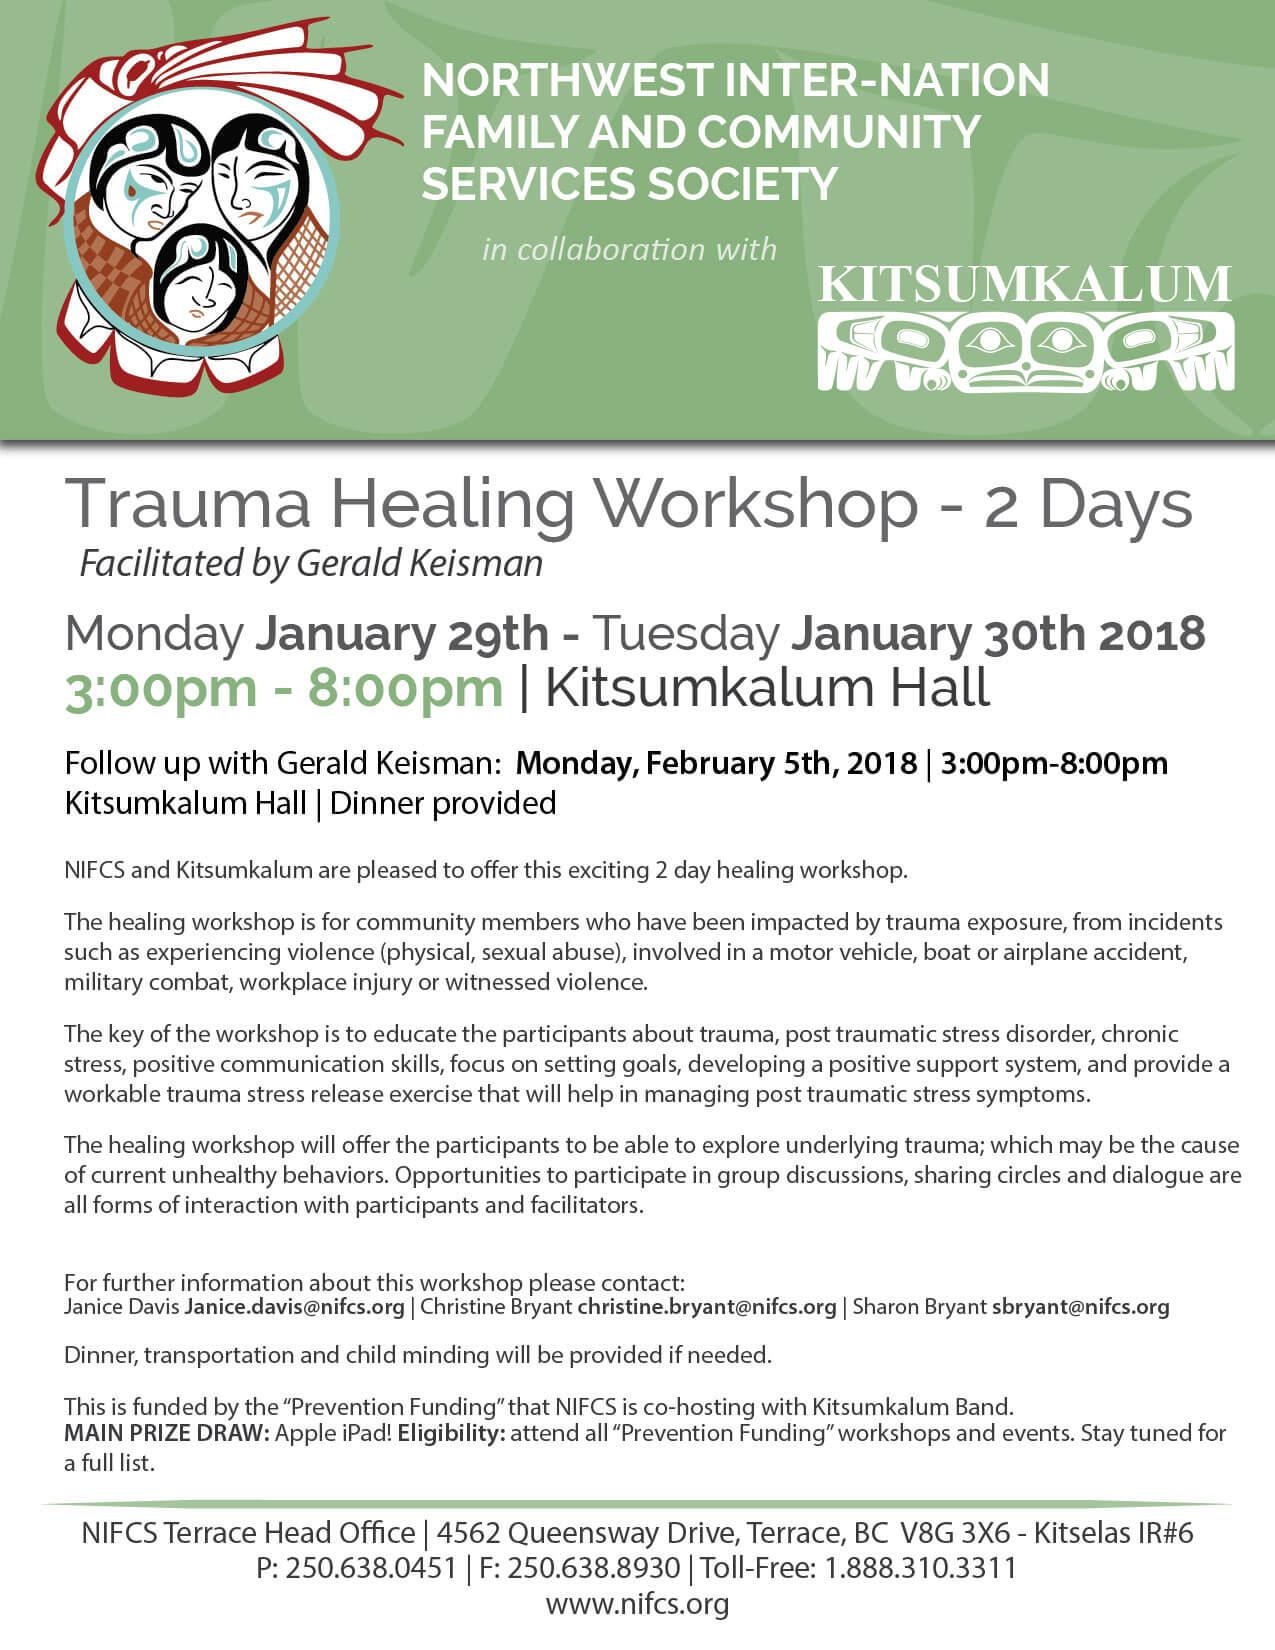 Trauma Healing Workshop Jan 29th and 30th